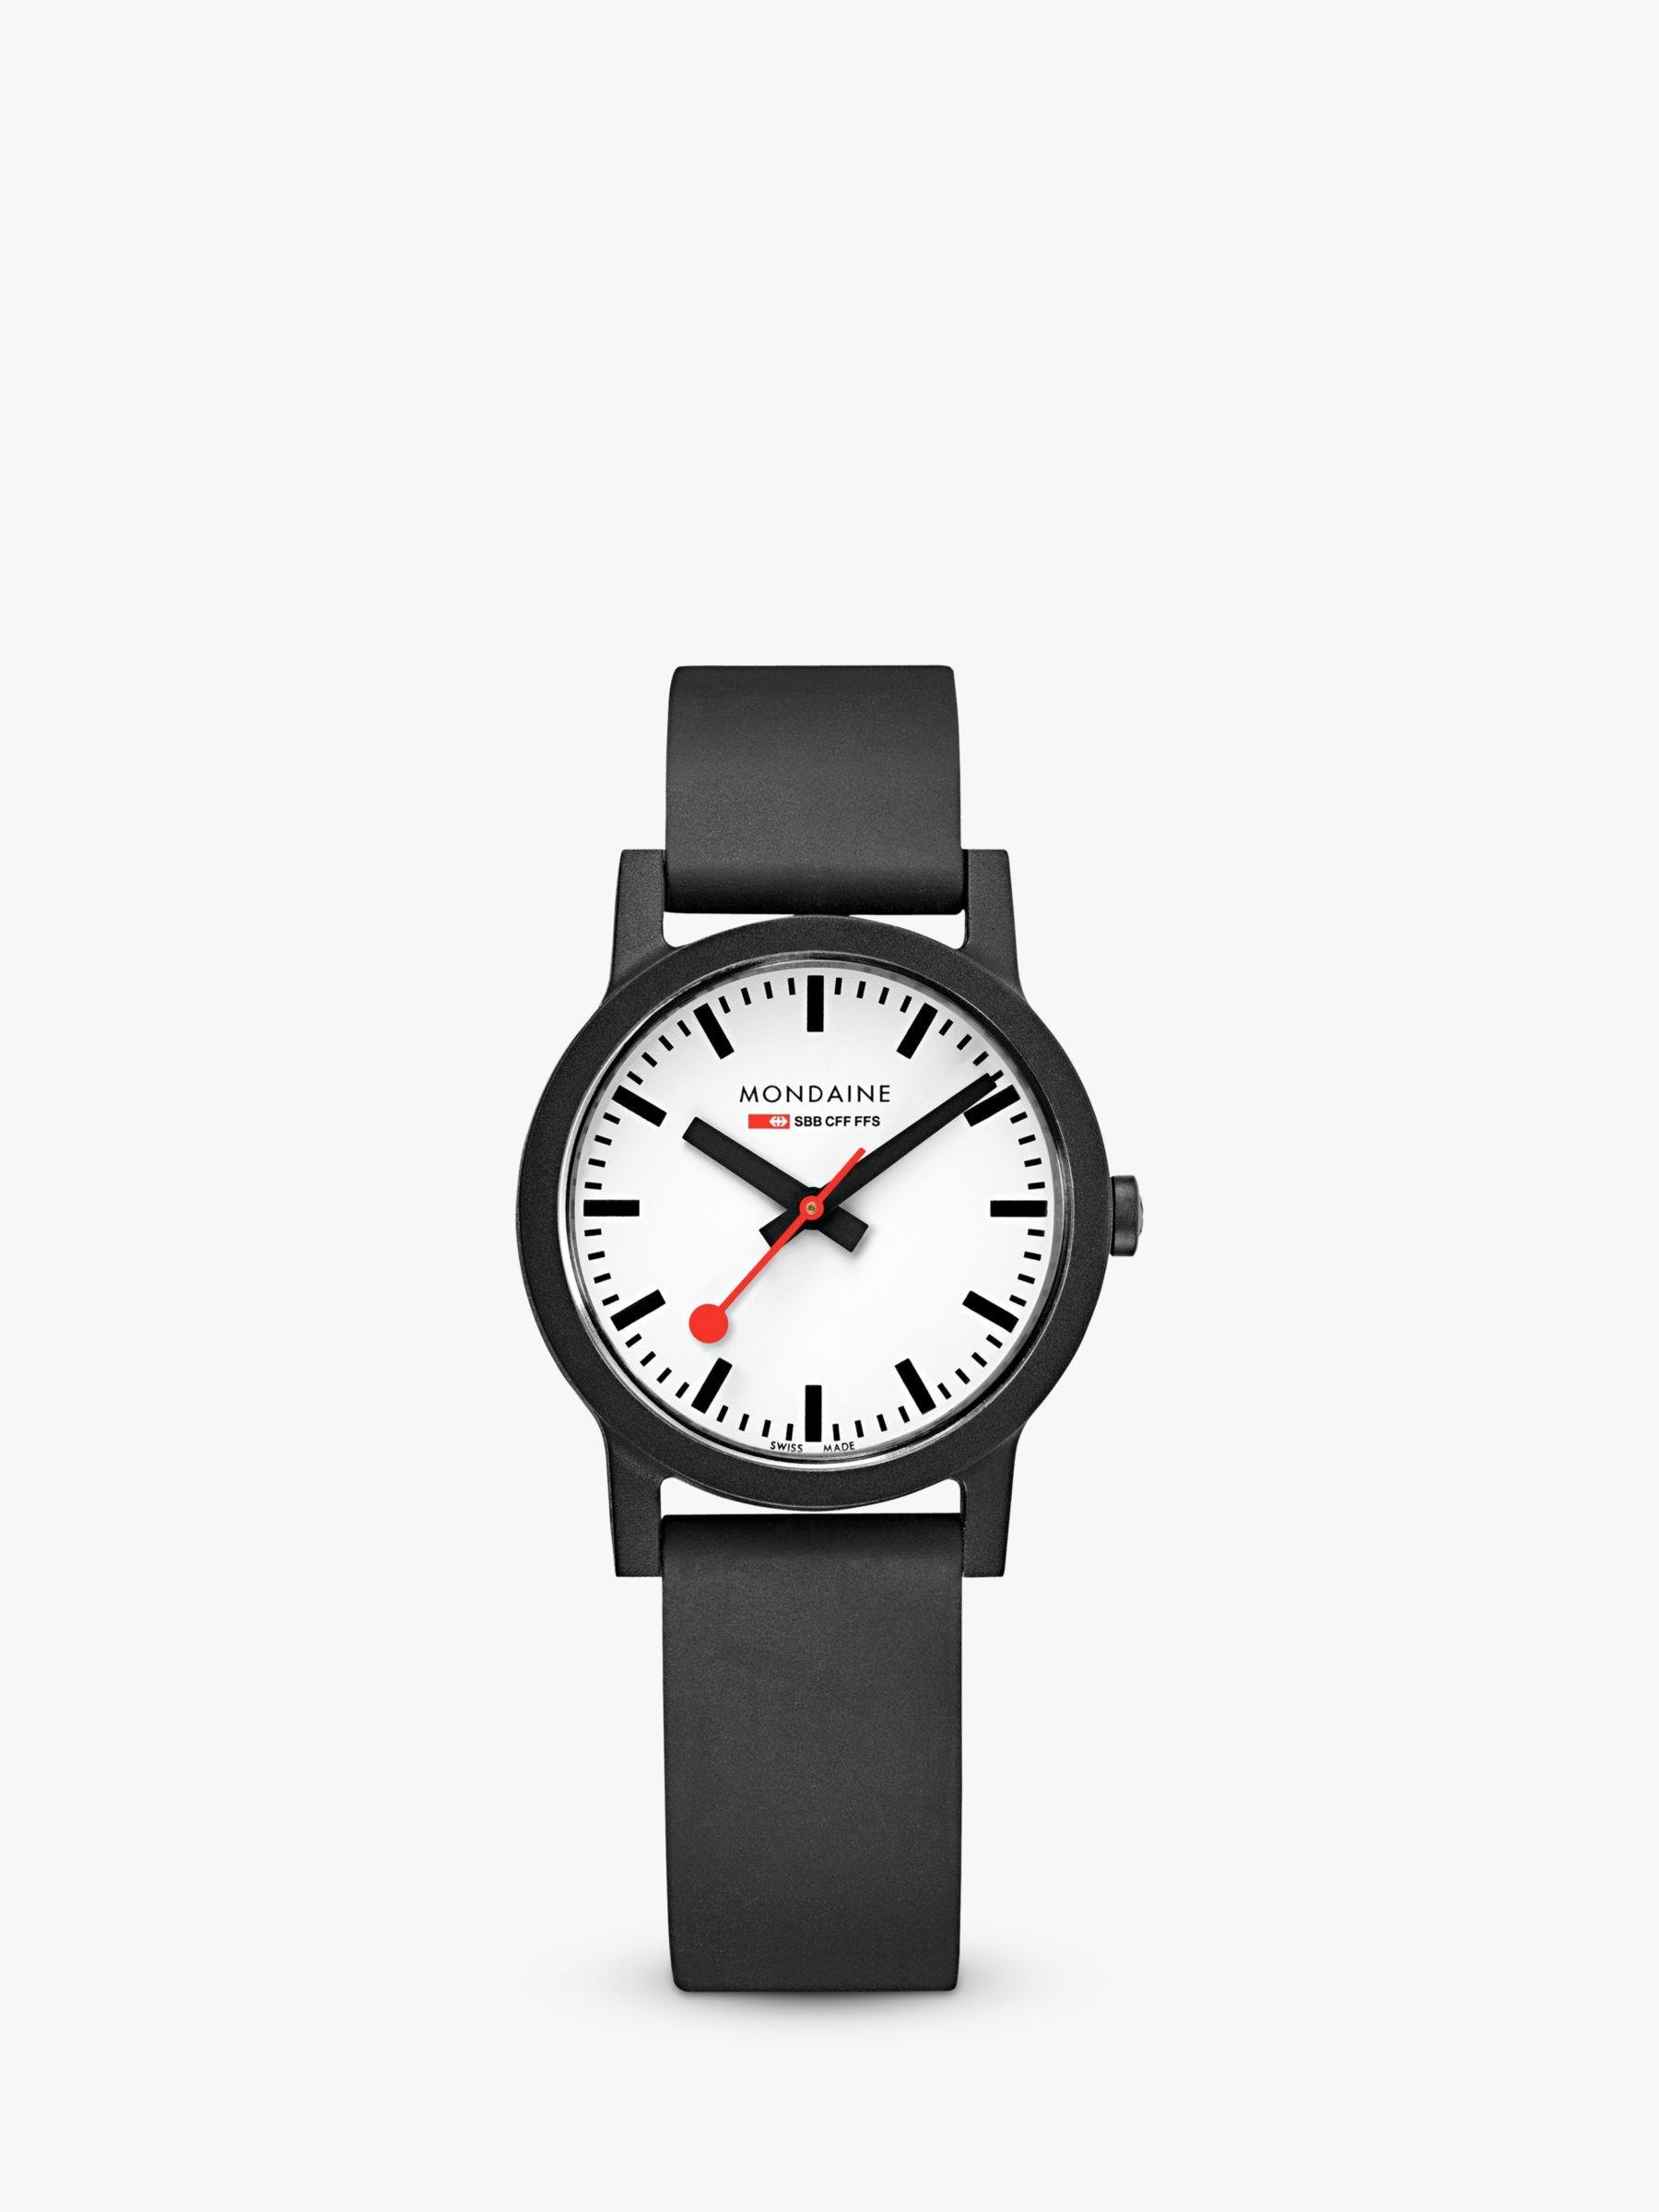 Mondaine Mondaine MS1.32110.RB Unisex Essence Rubber Strap Watch, Black/White